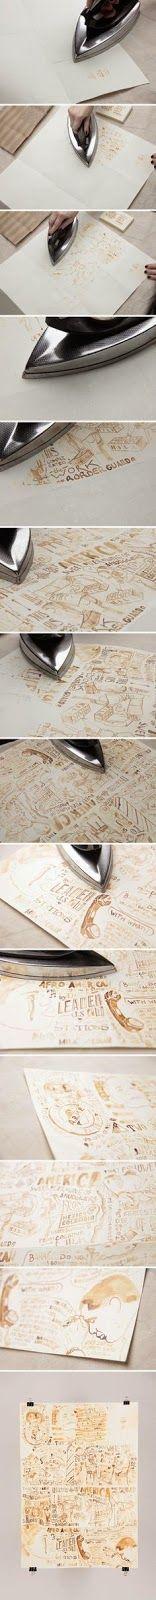 DIY milk on paper